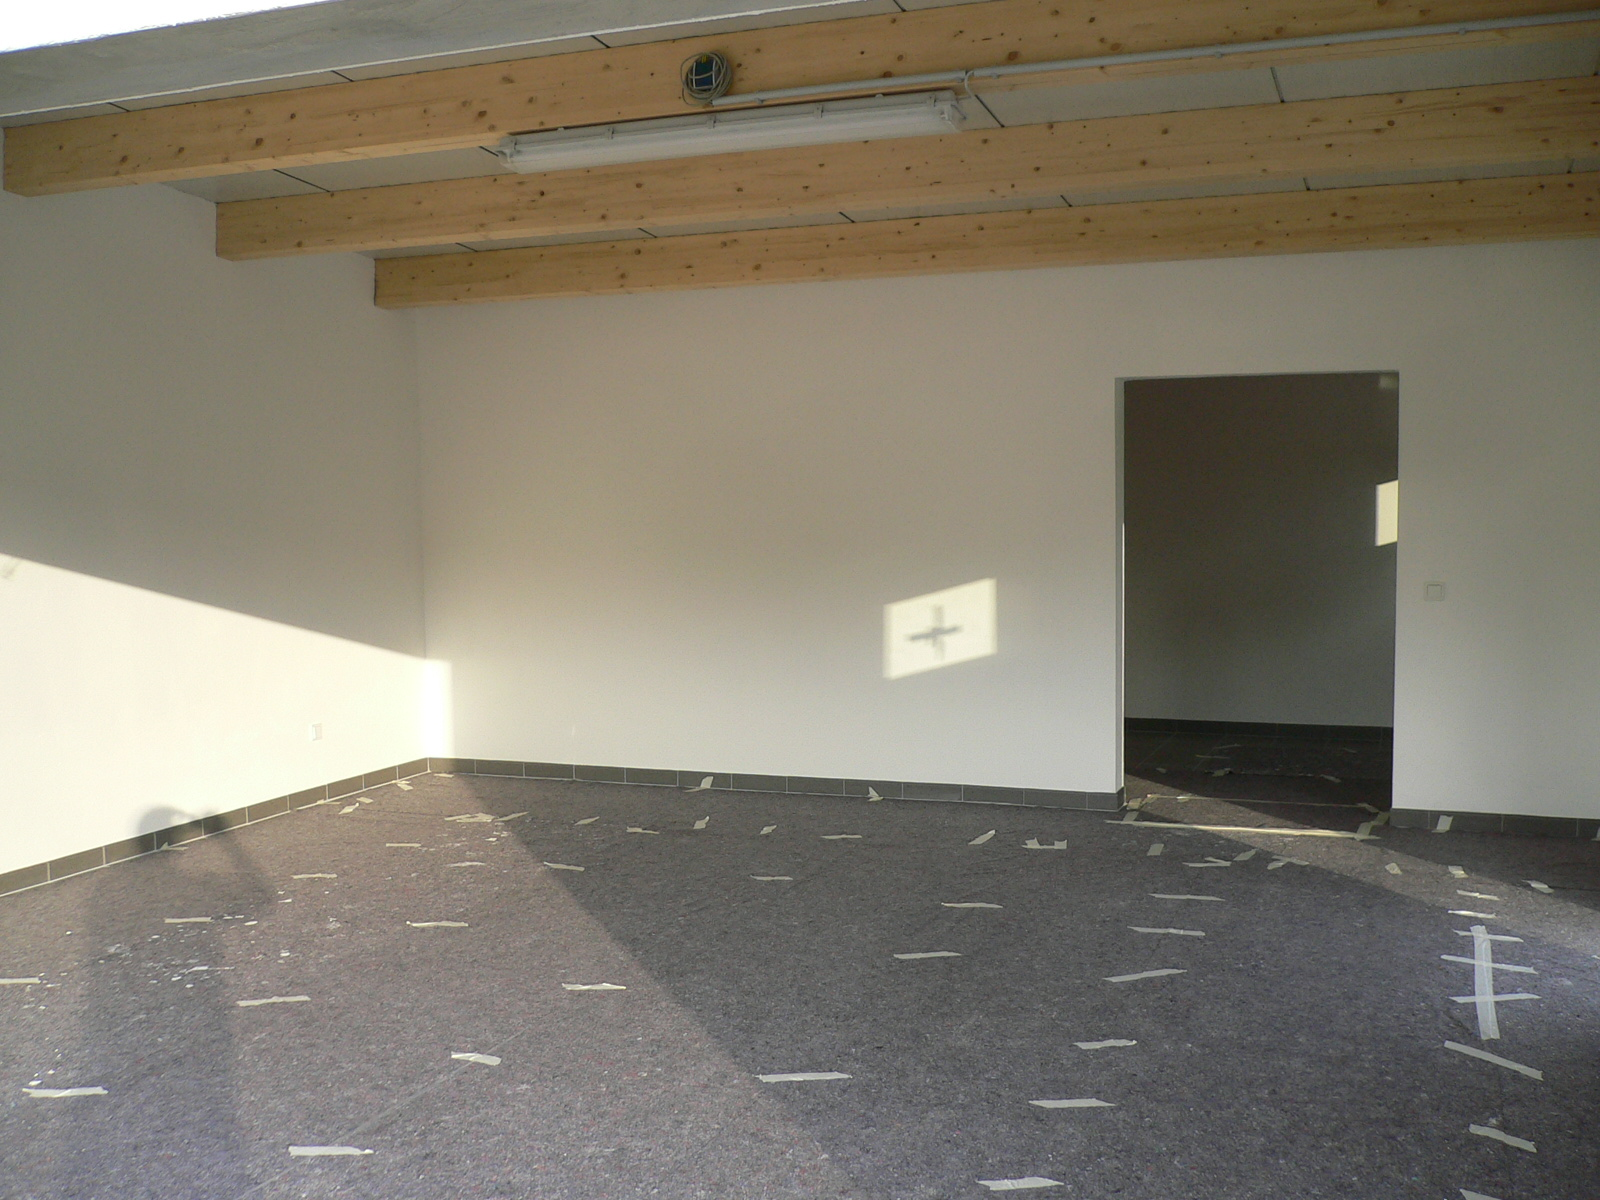 danwood haus park 128p bei idar oberstein garage fast fertig. Black Bedroom Furniture Sets. Home Design Ideas